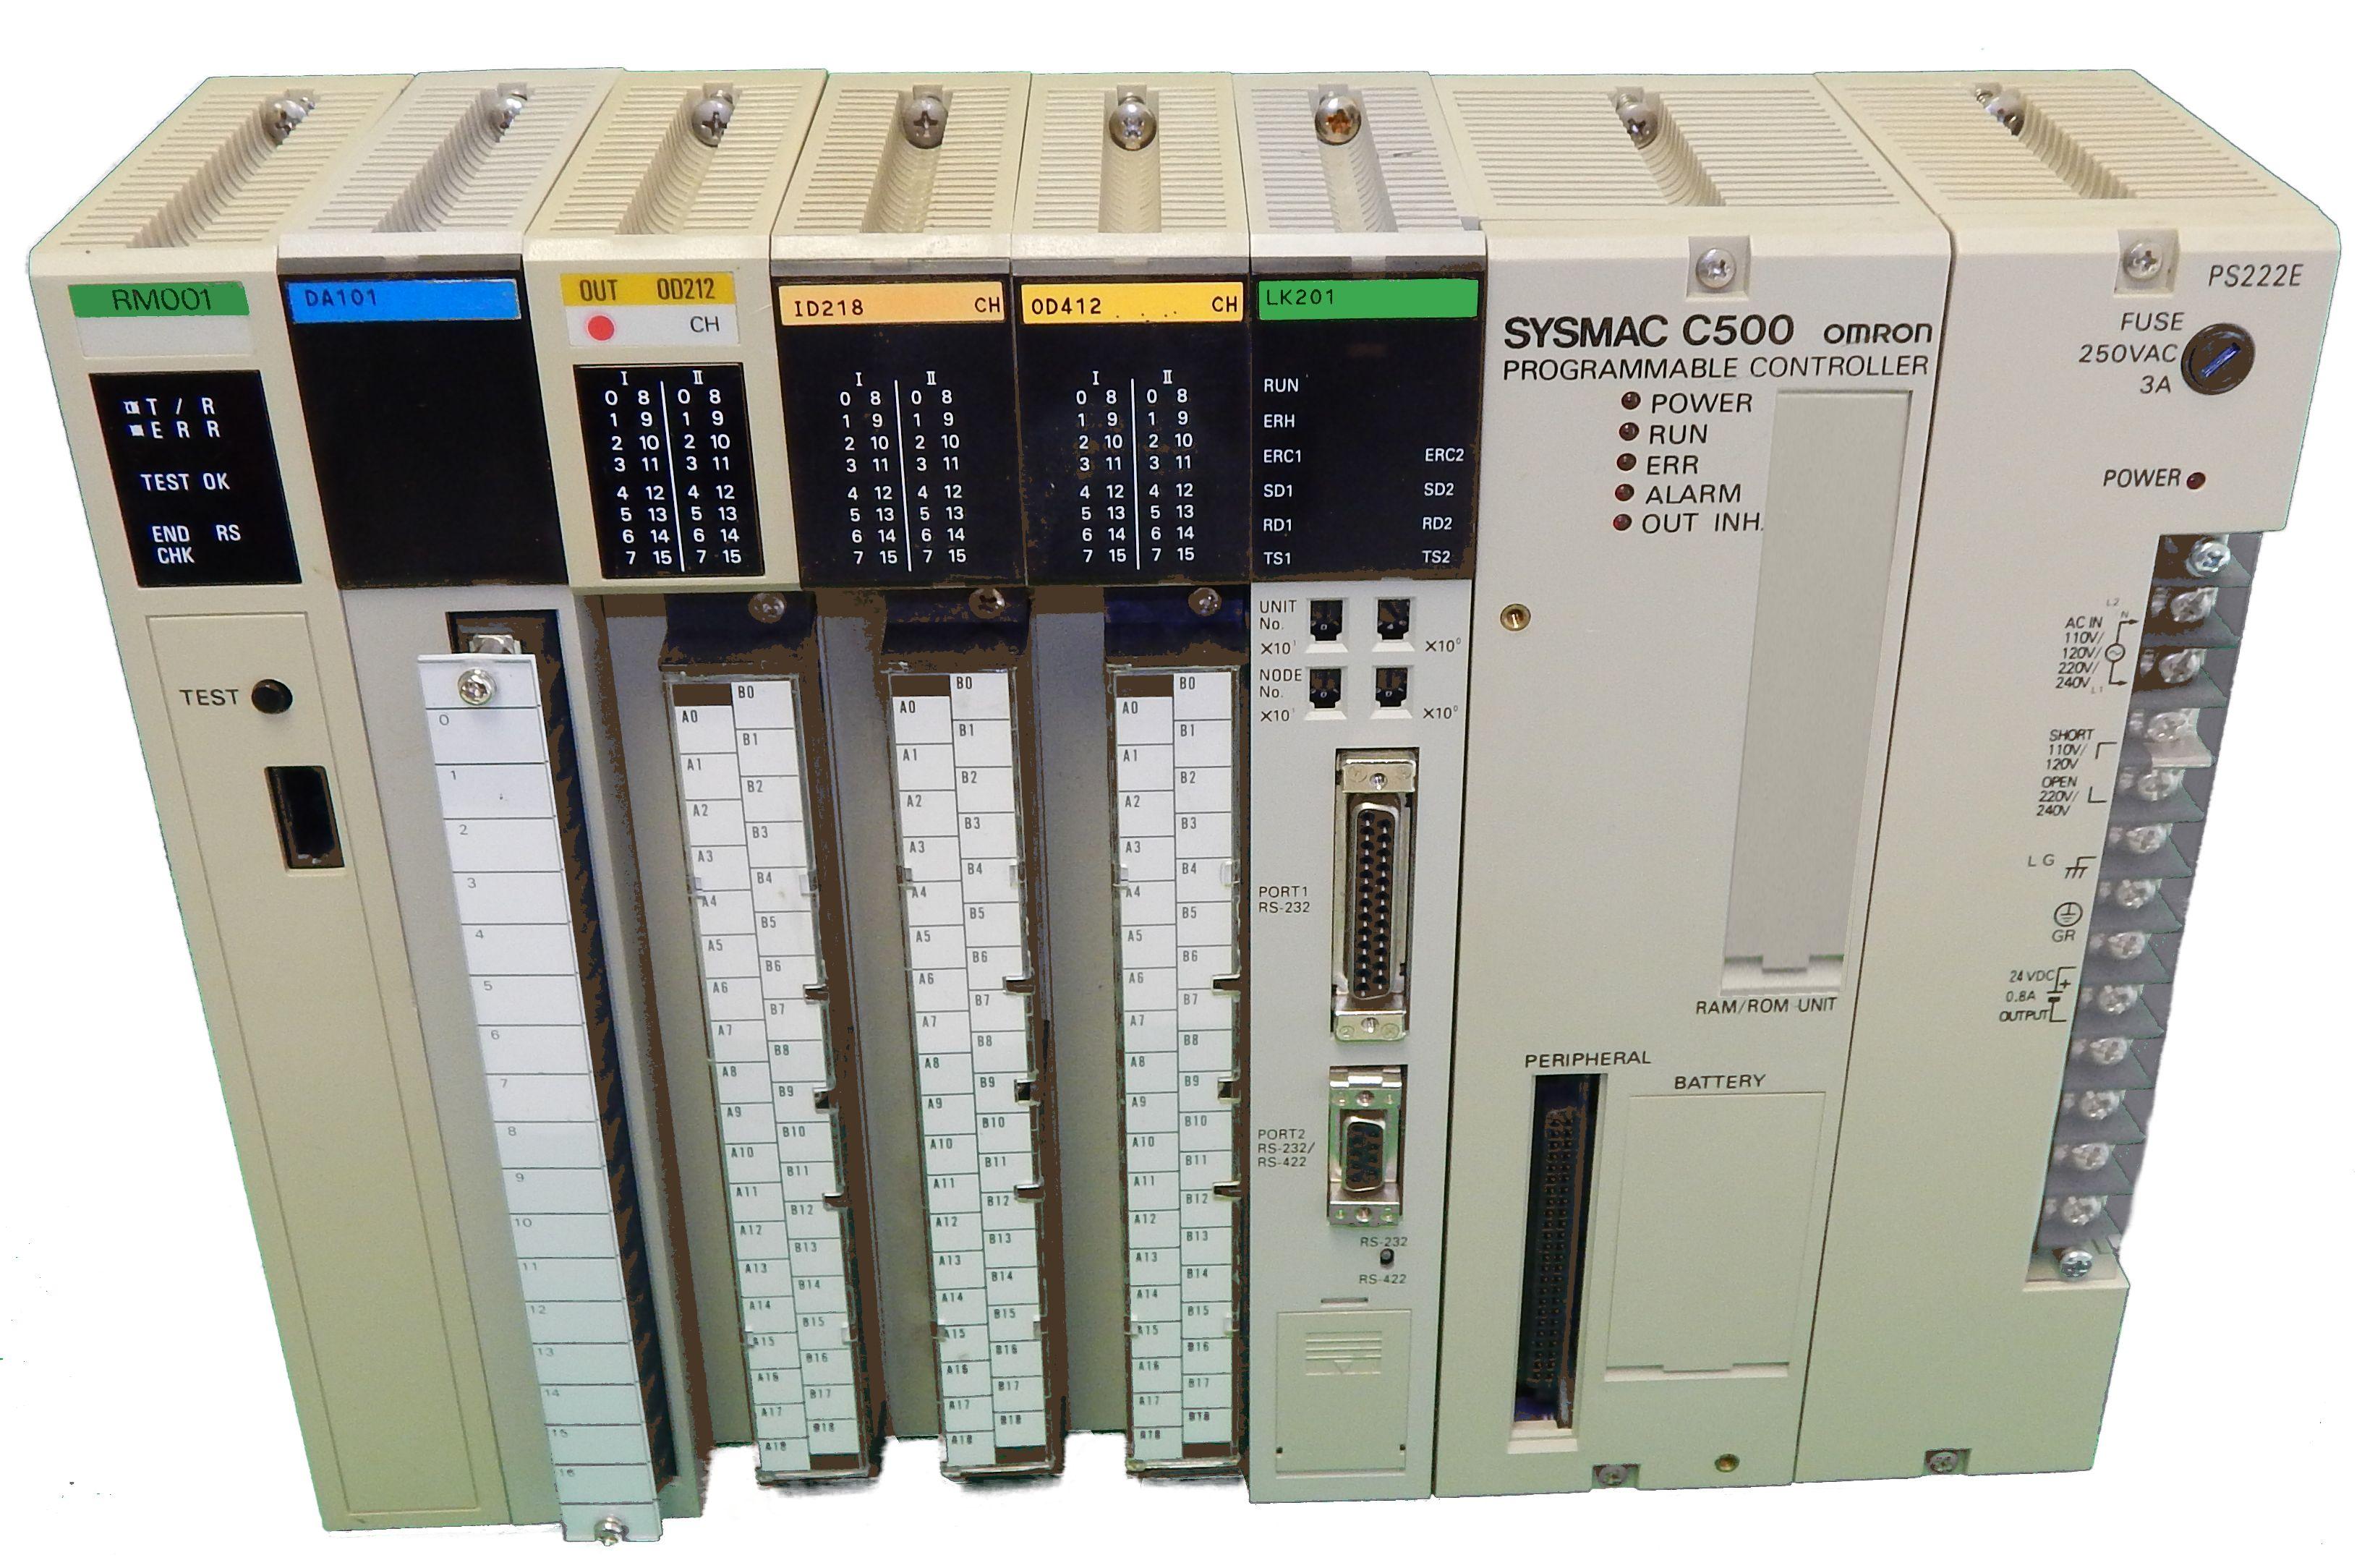 3G2C4-SI022